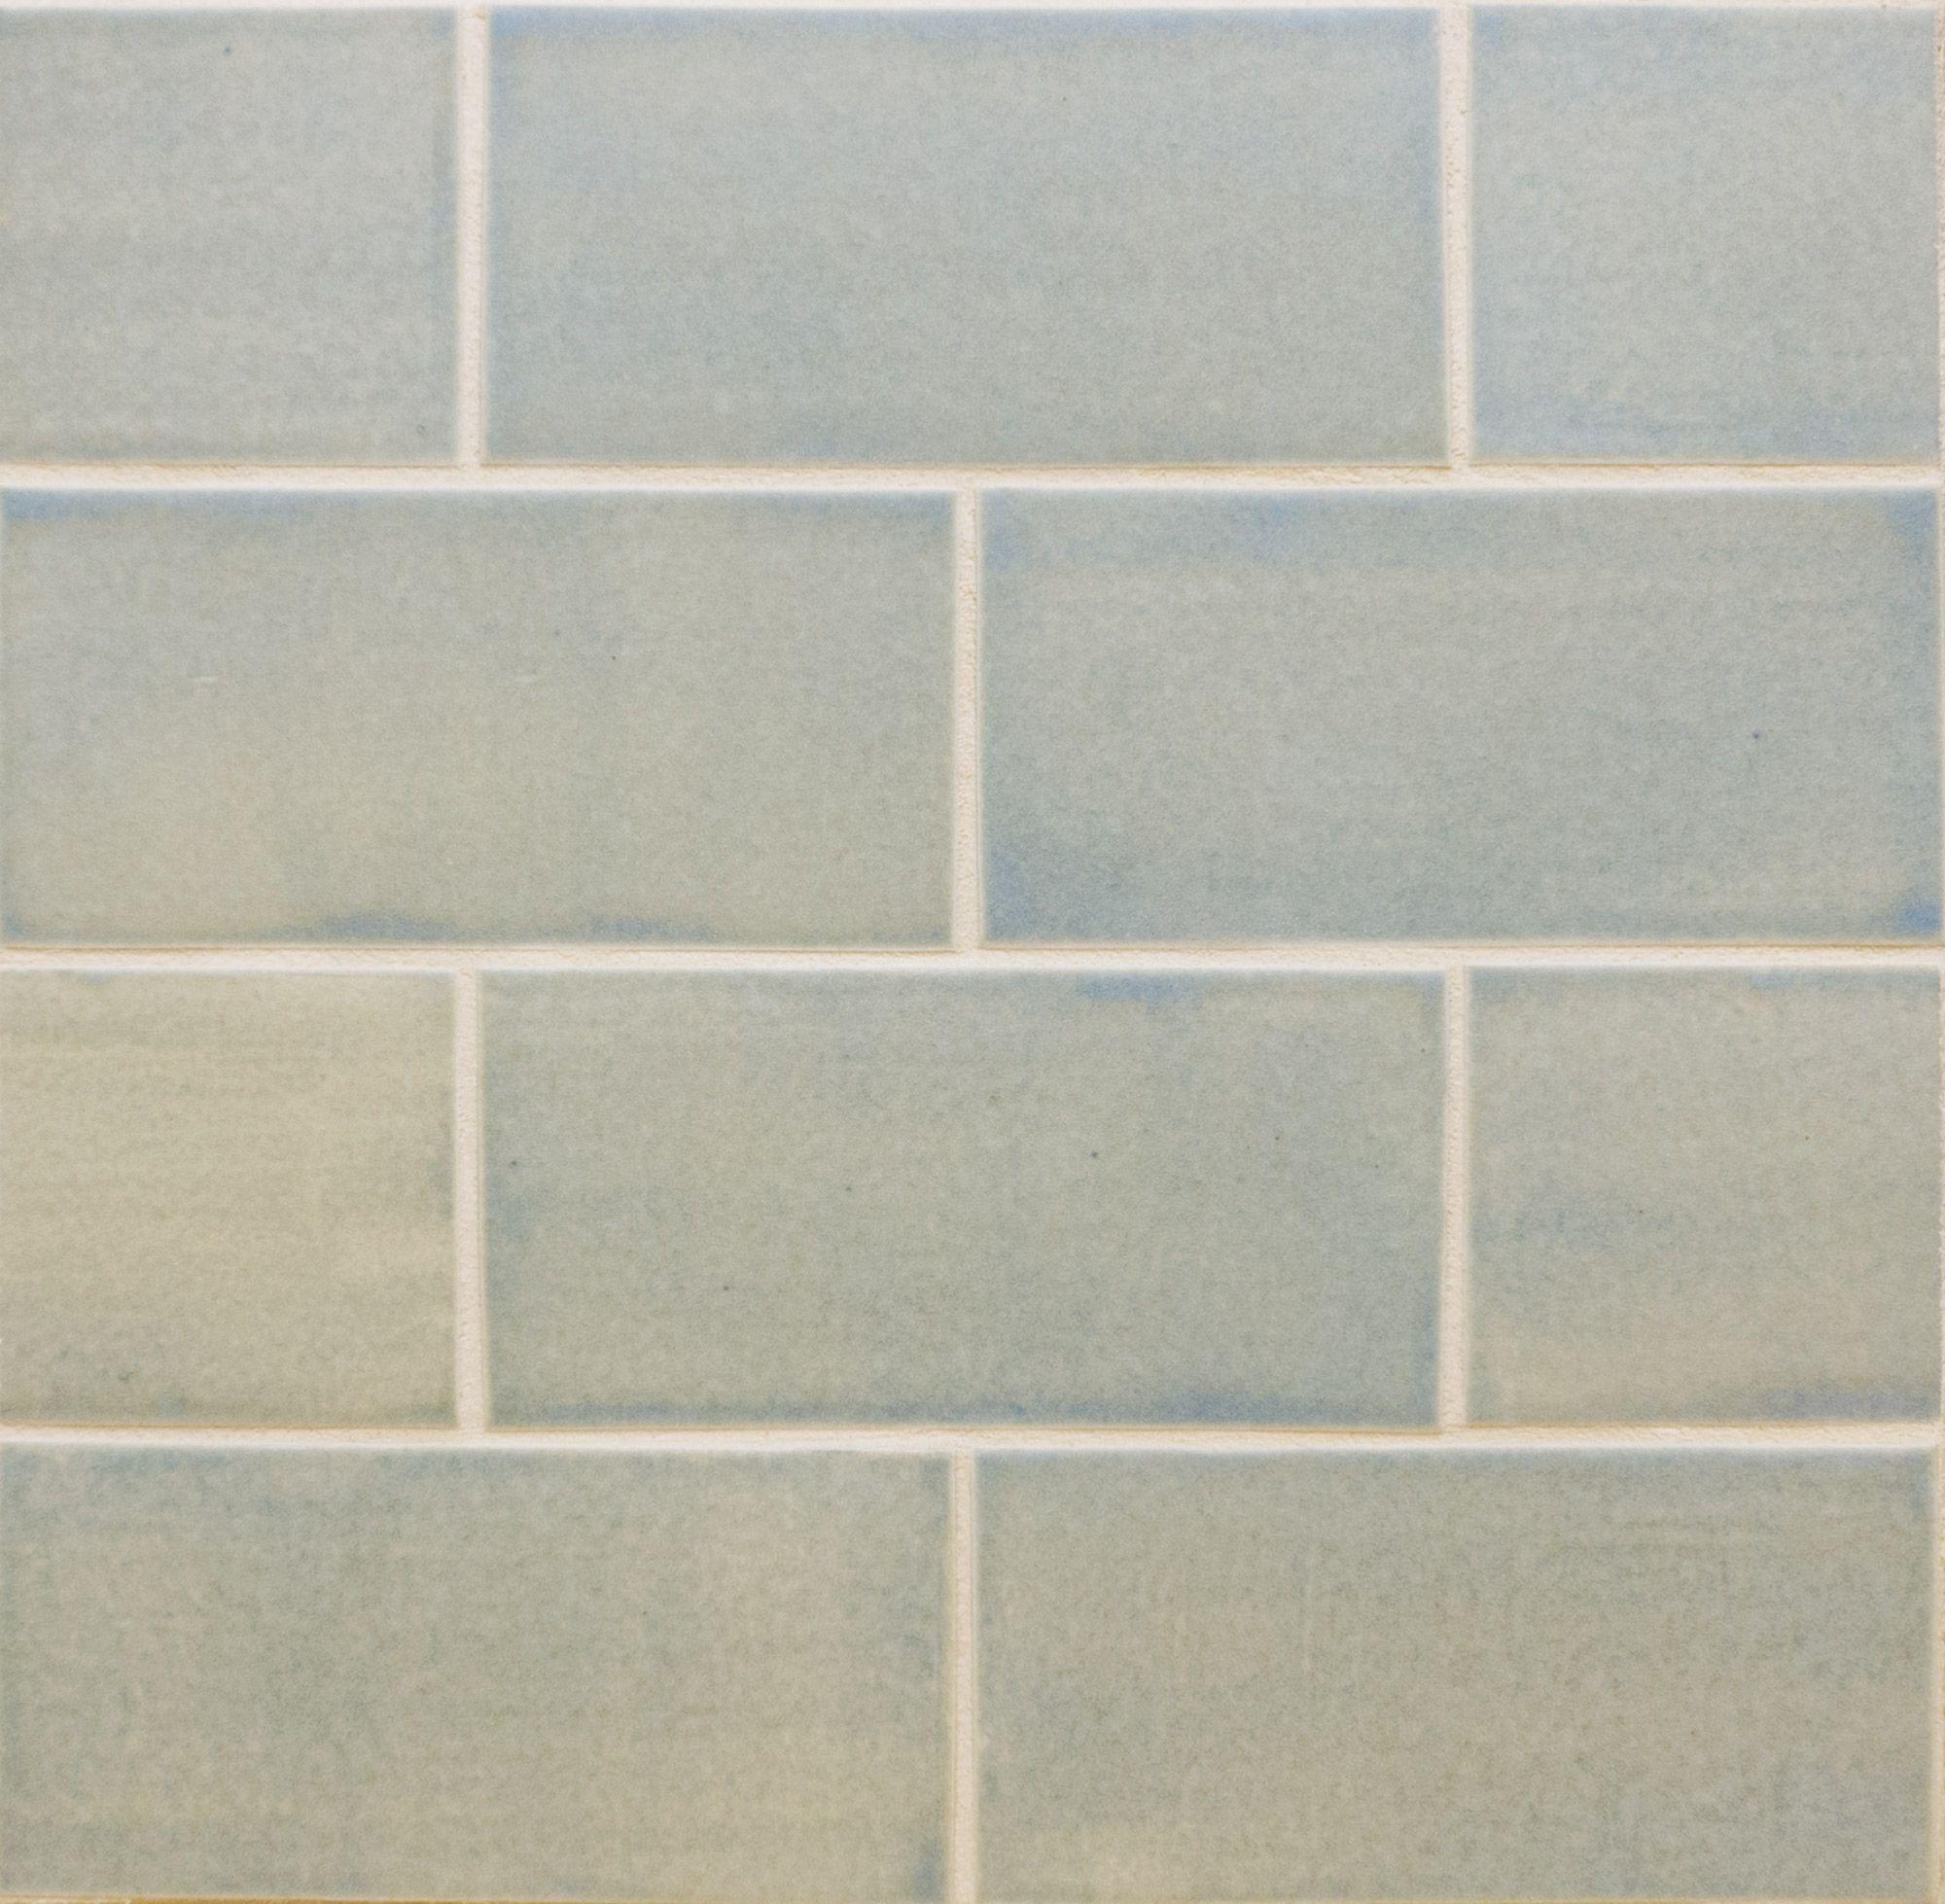 Field subway tile subway tiles mosaics and tile patterns field subway tile dailygadgetfo Images